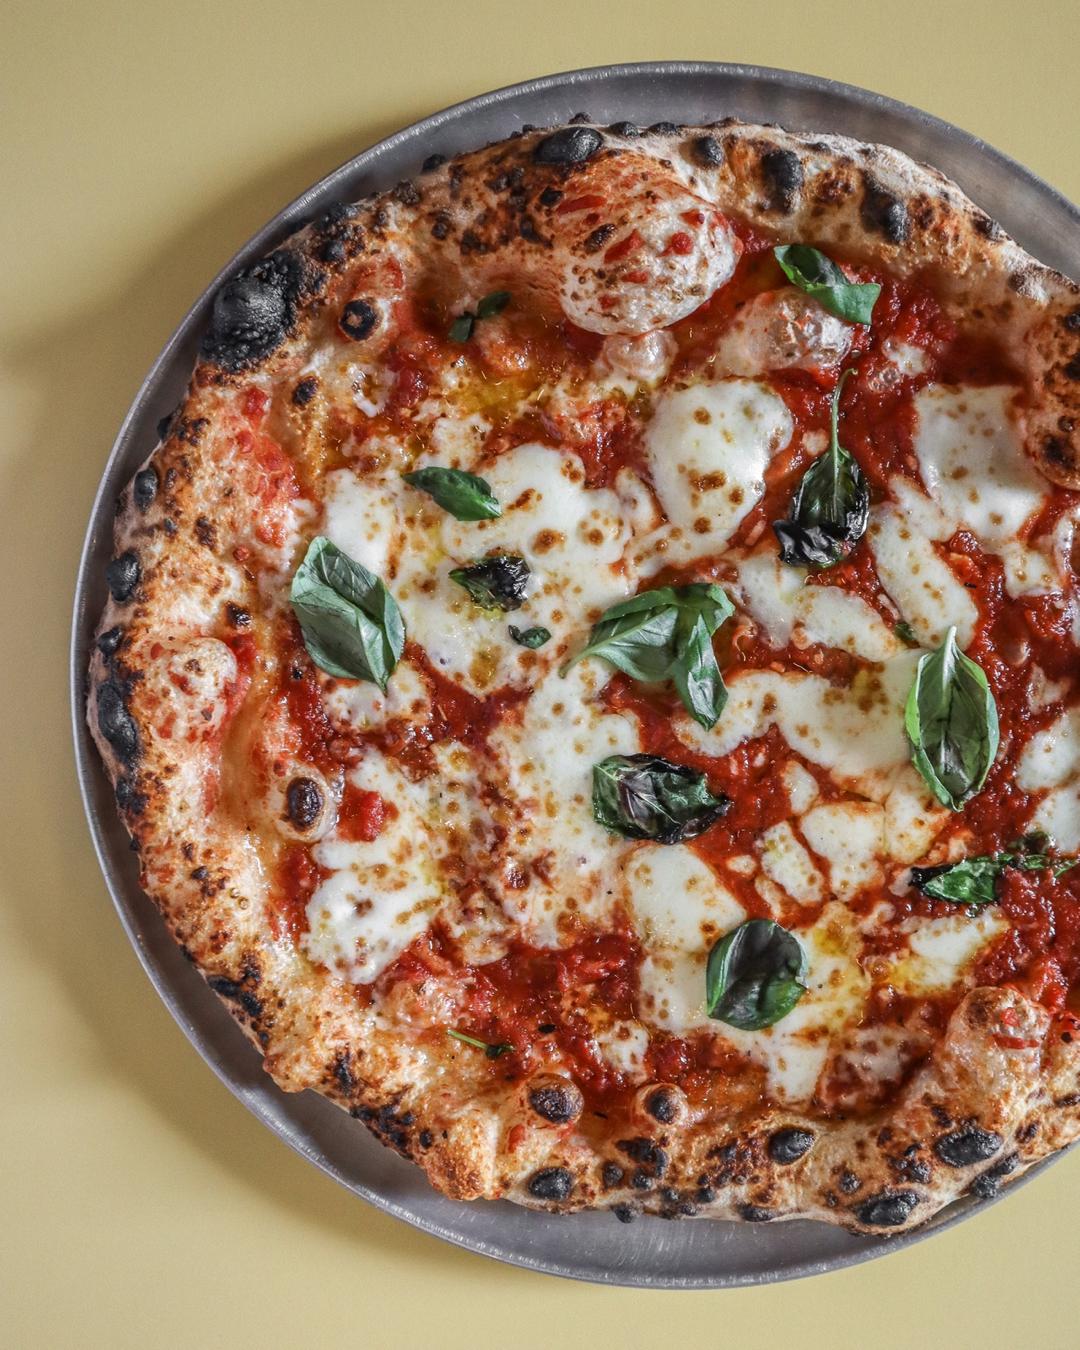 Tomato, buffalo mozzarella, fresh basil and extra virgin olive oil on Umu Pizza's sourdough base